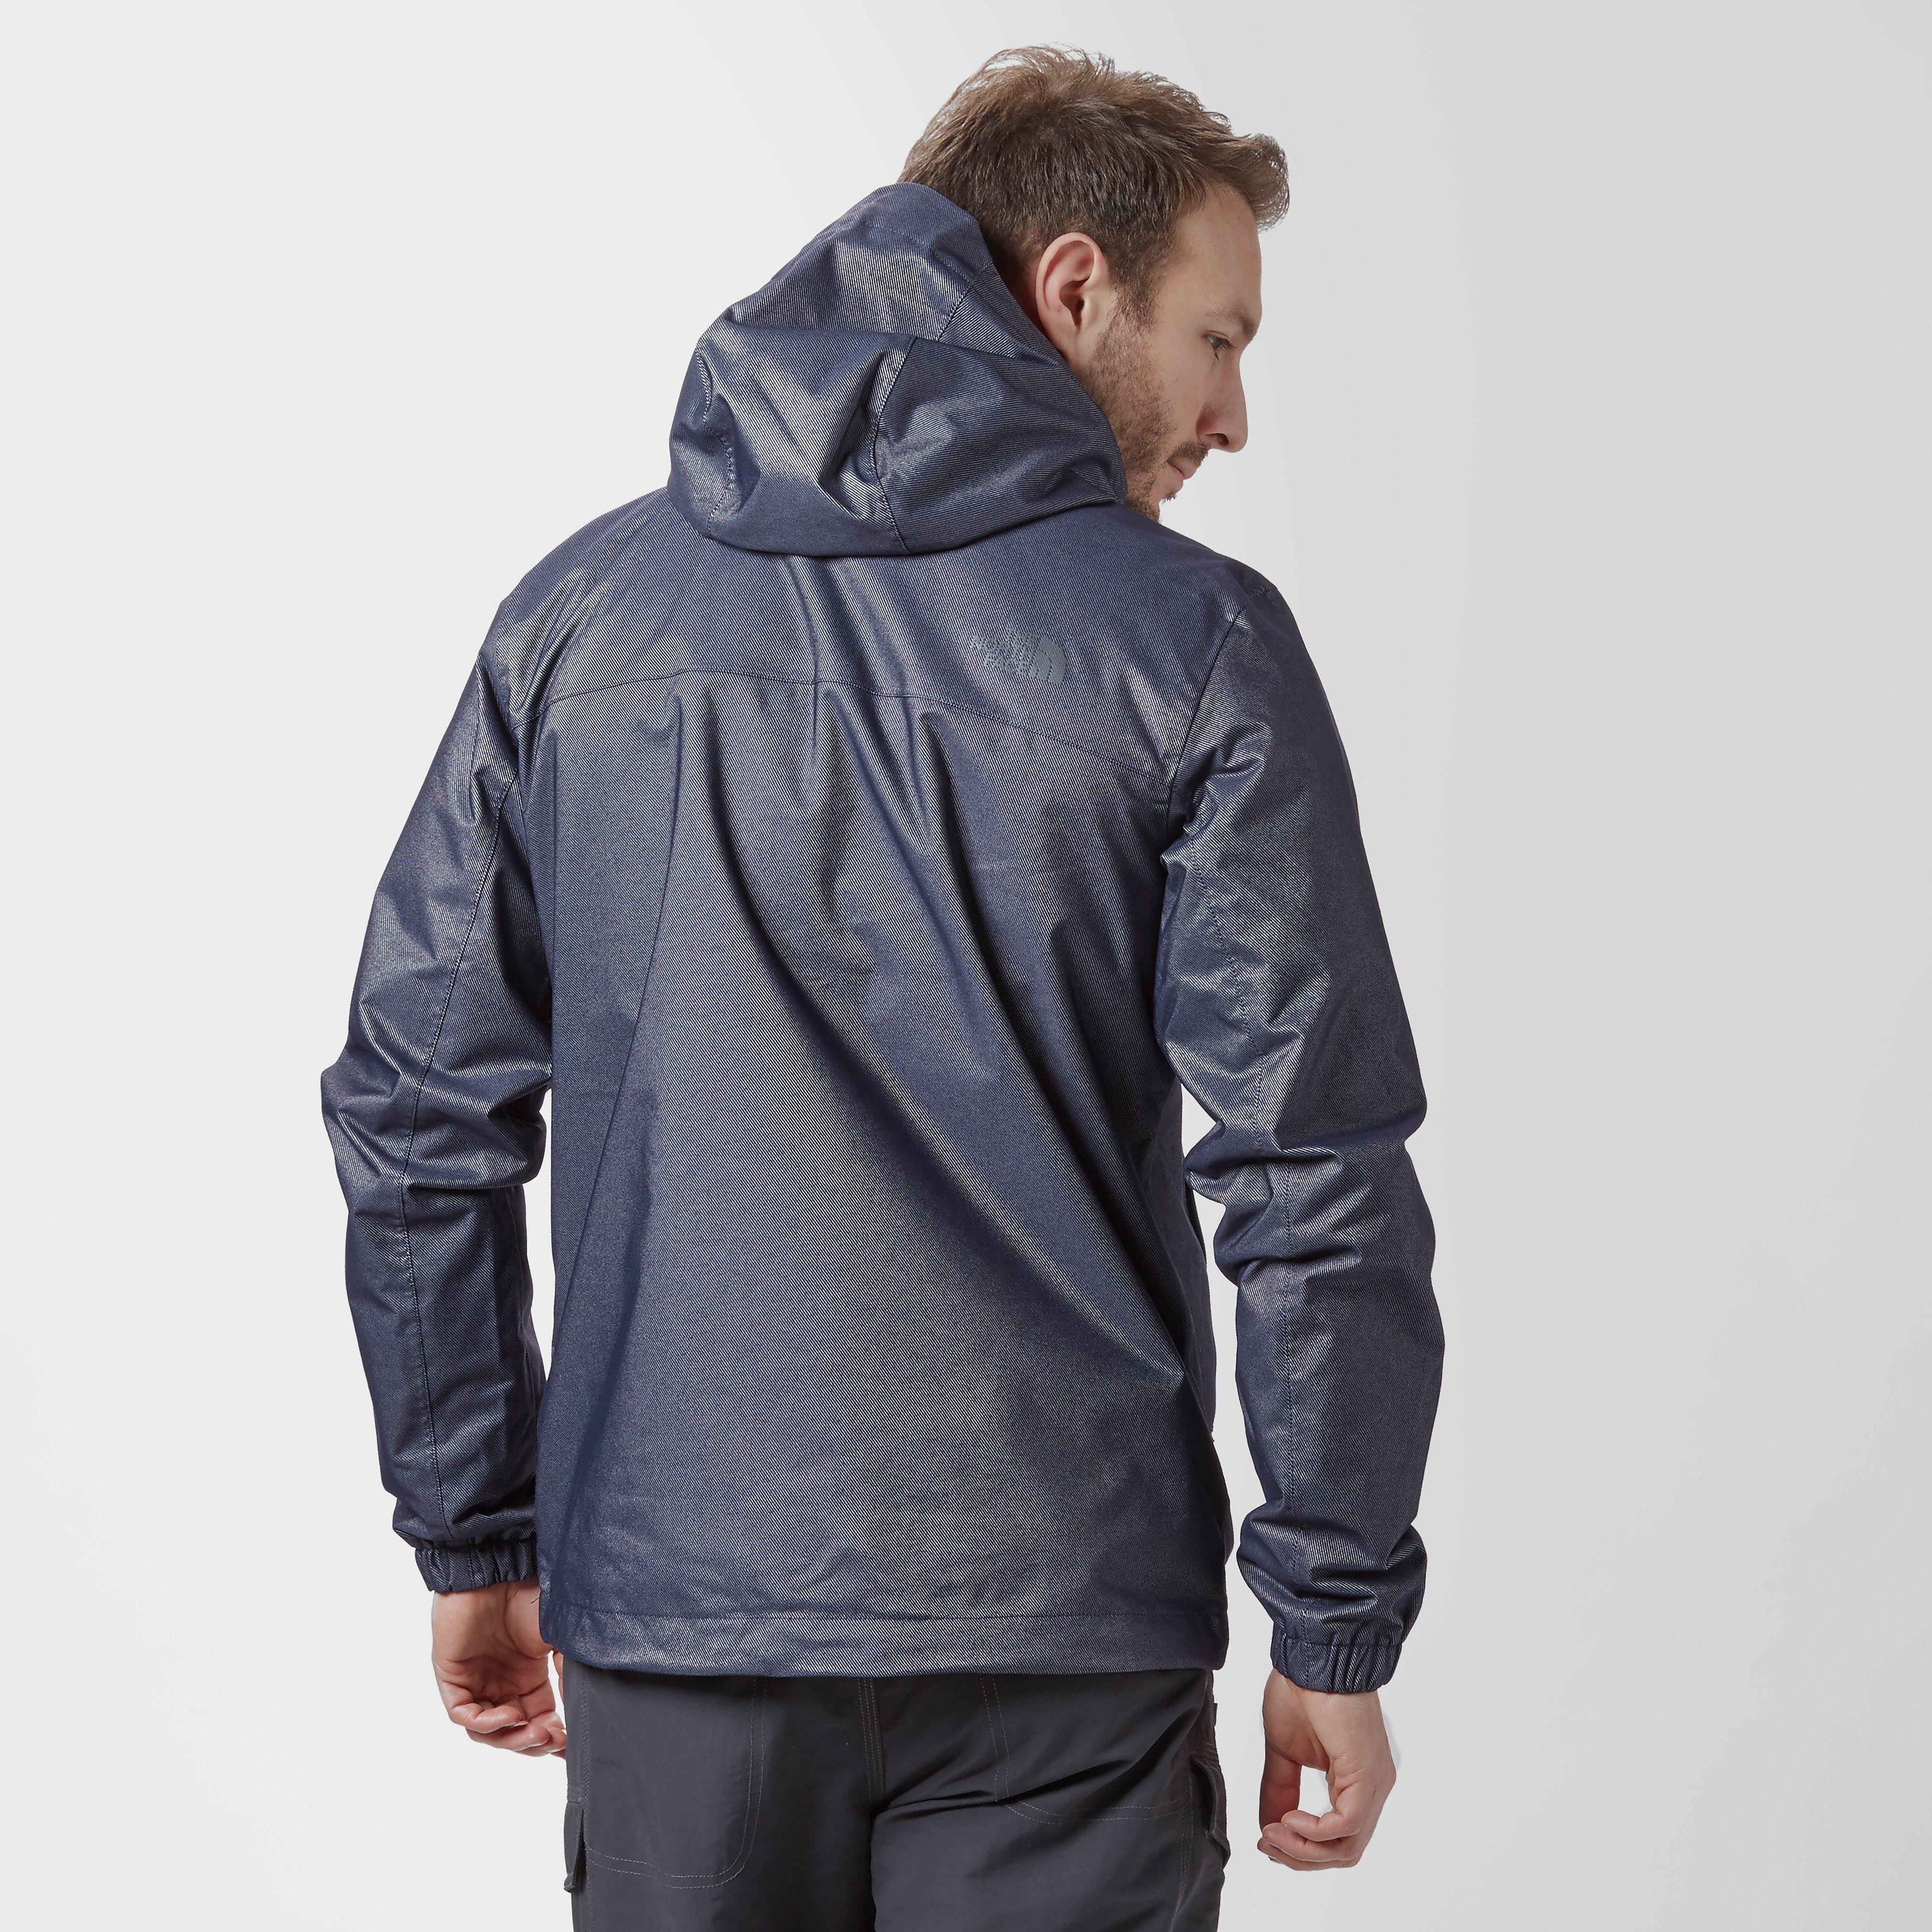 The North Face Millerton Men's Jacket